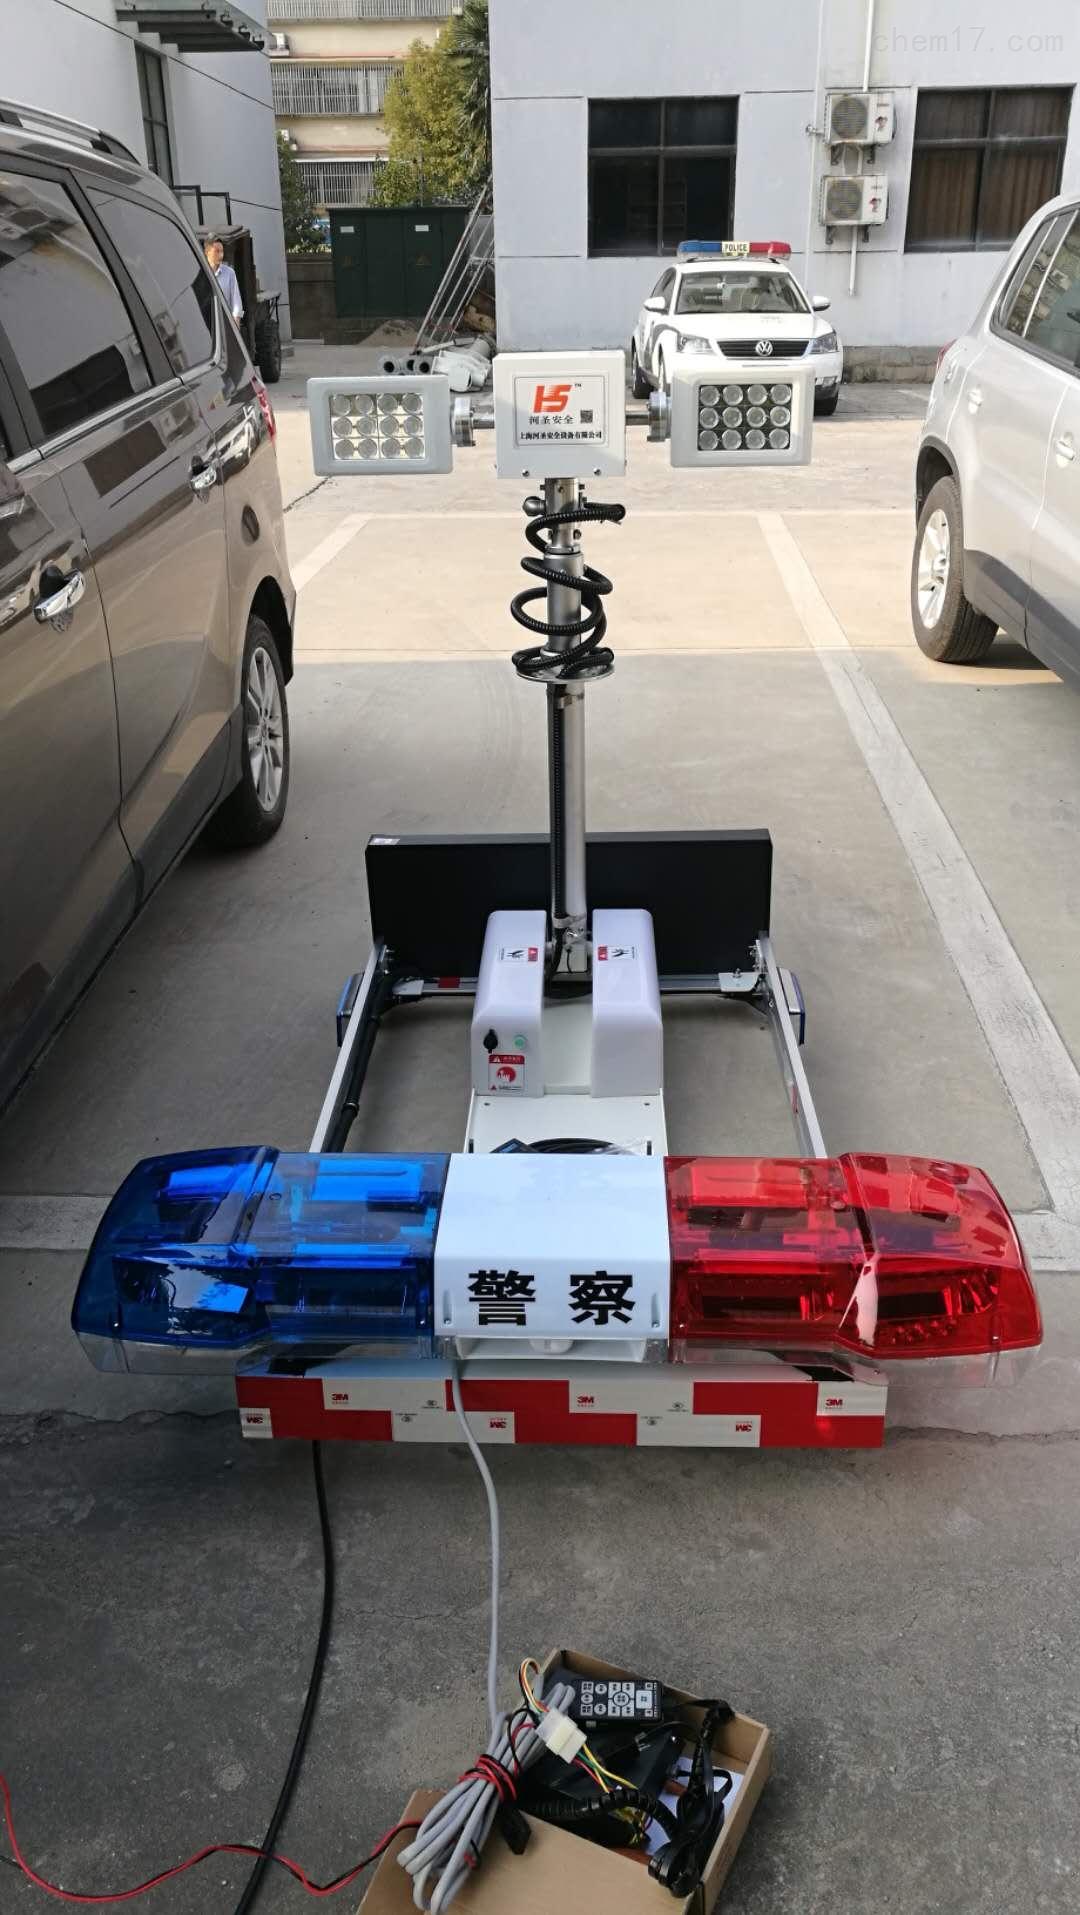 600W聚光灯 车辆用照明设备 现场监控录像 定制服务